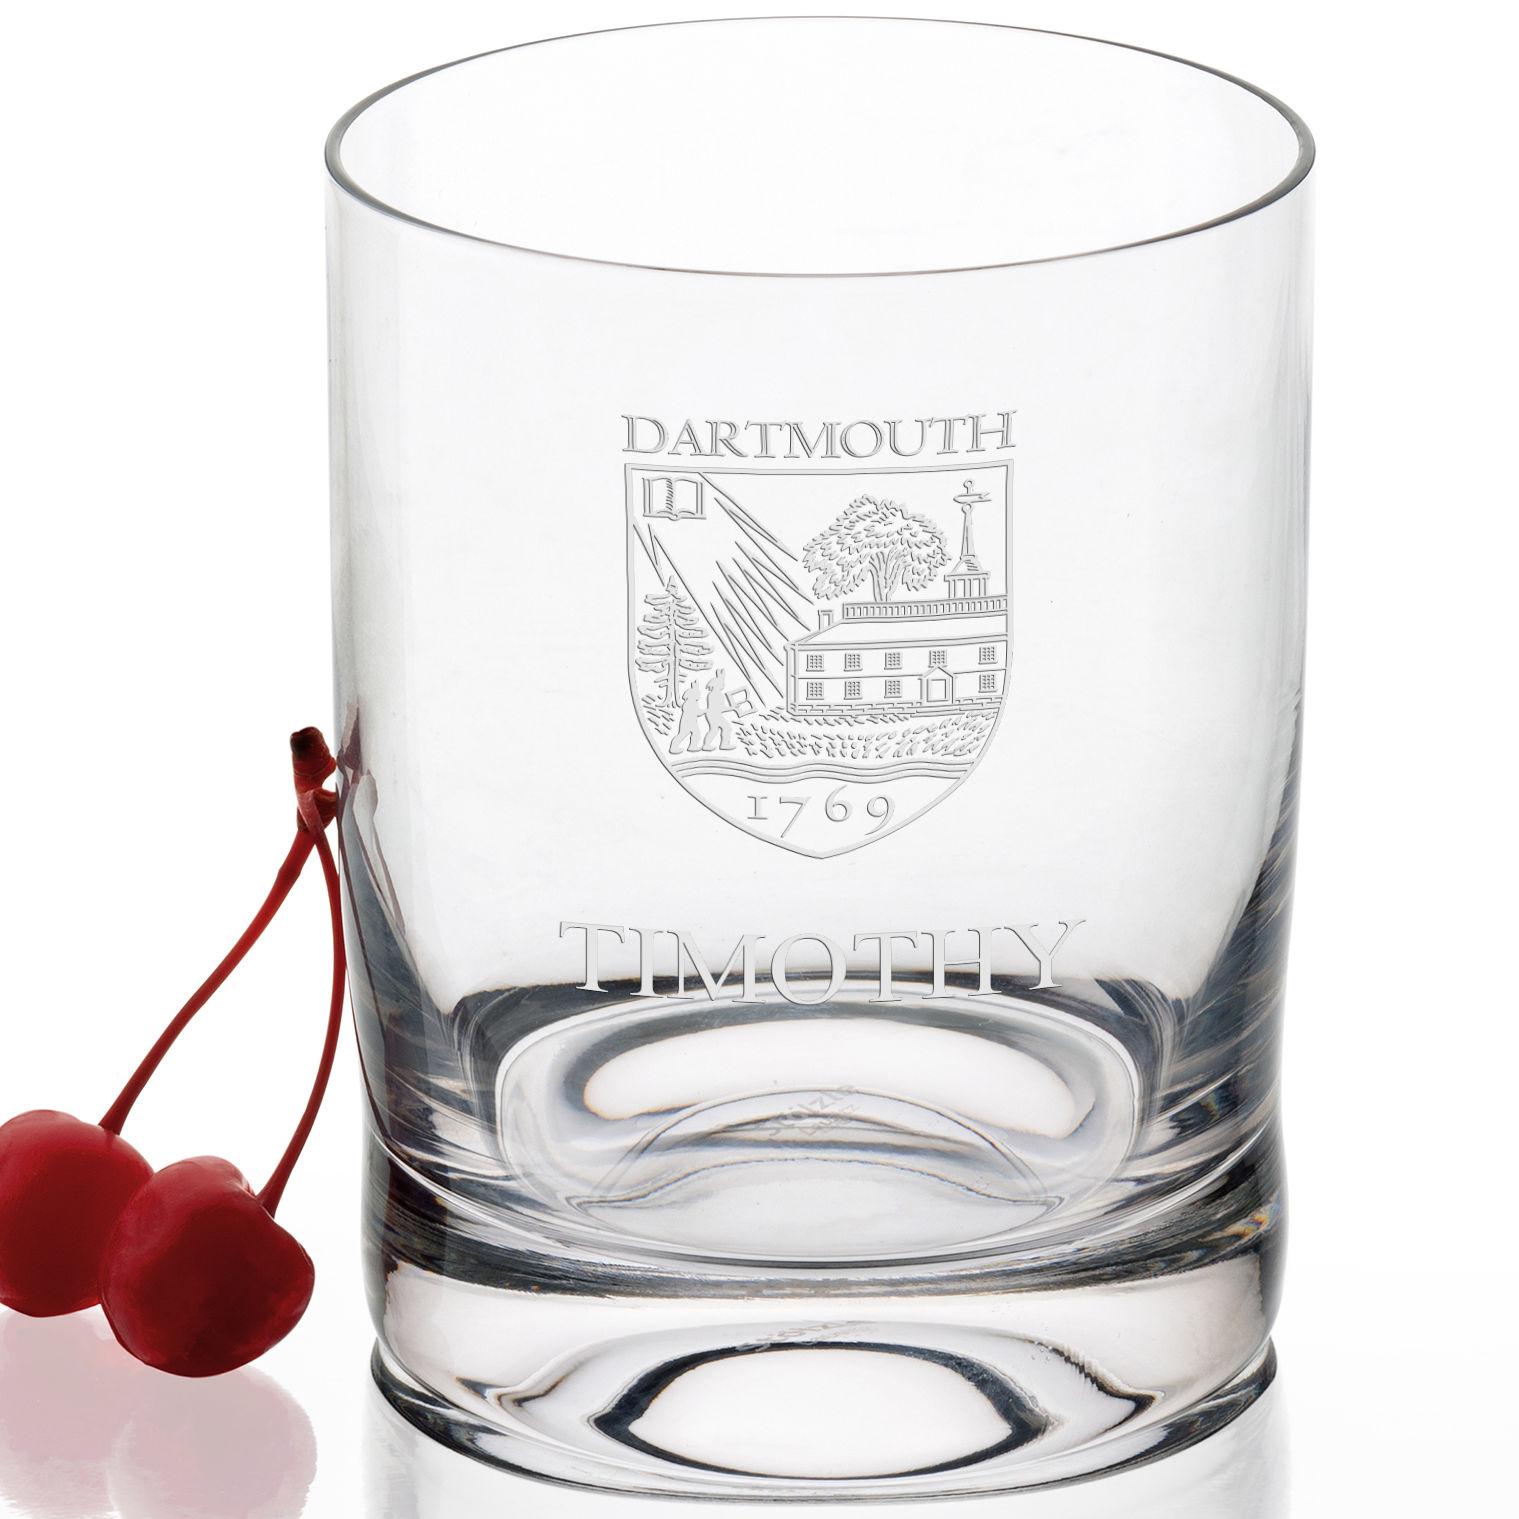 Dartmouth College Tumbler Glasses - Set of 4 - Image 2